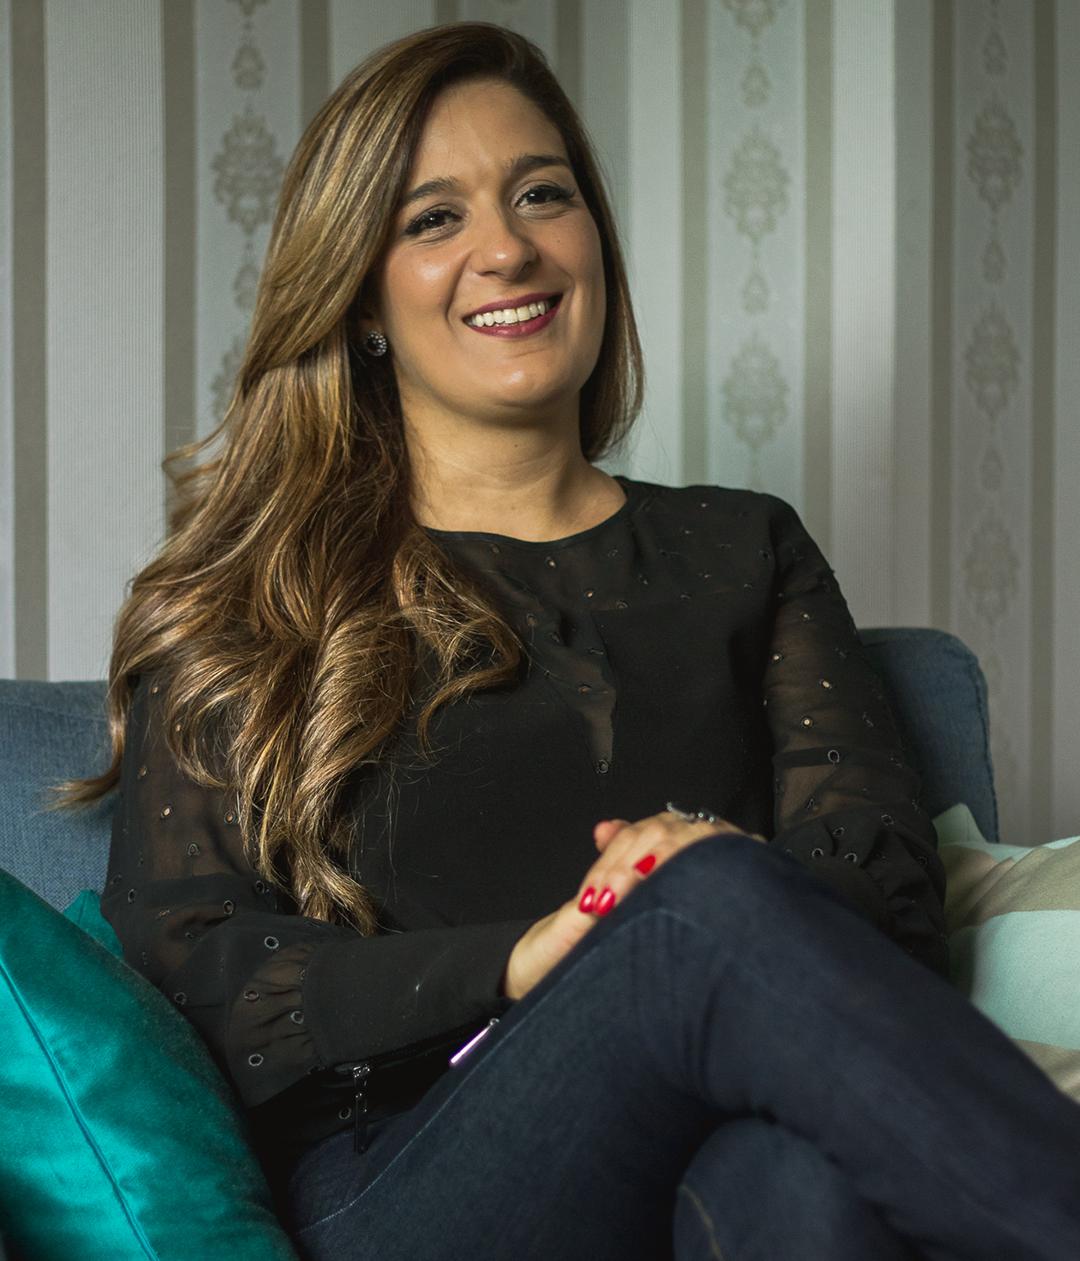 Andréia de Figueiredo Antunes, Psicóloga, CRP: 06/141335